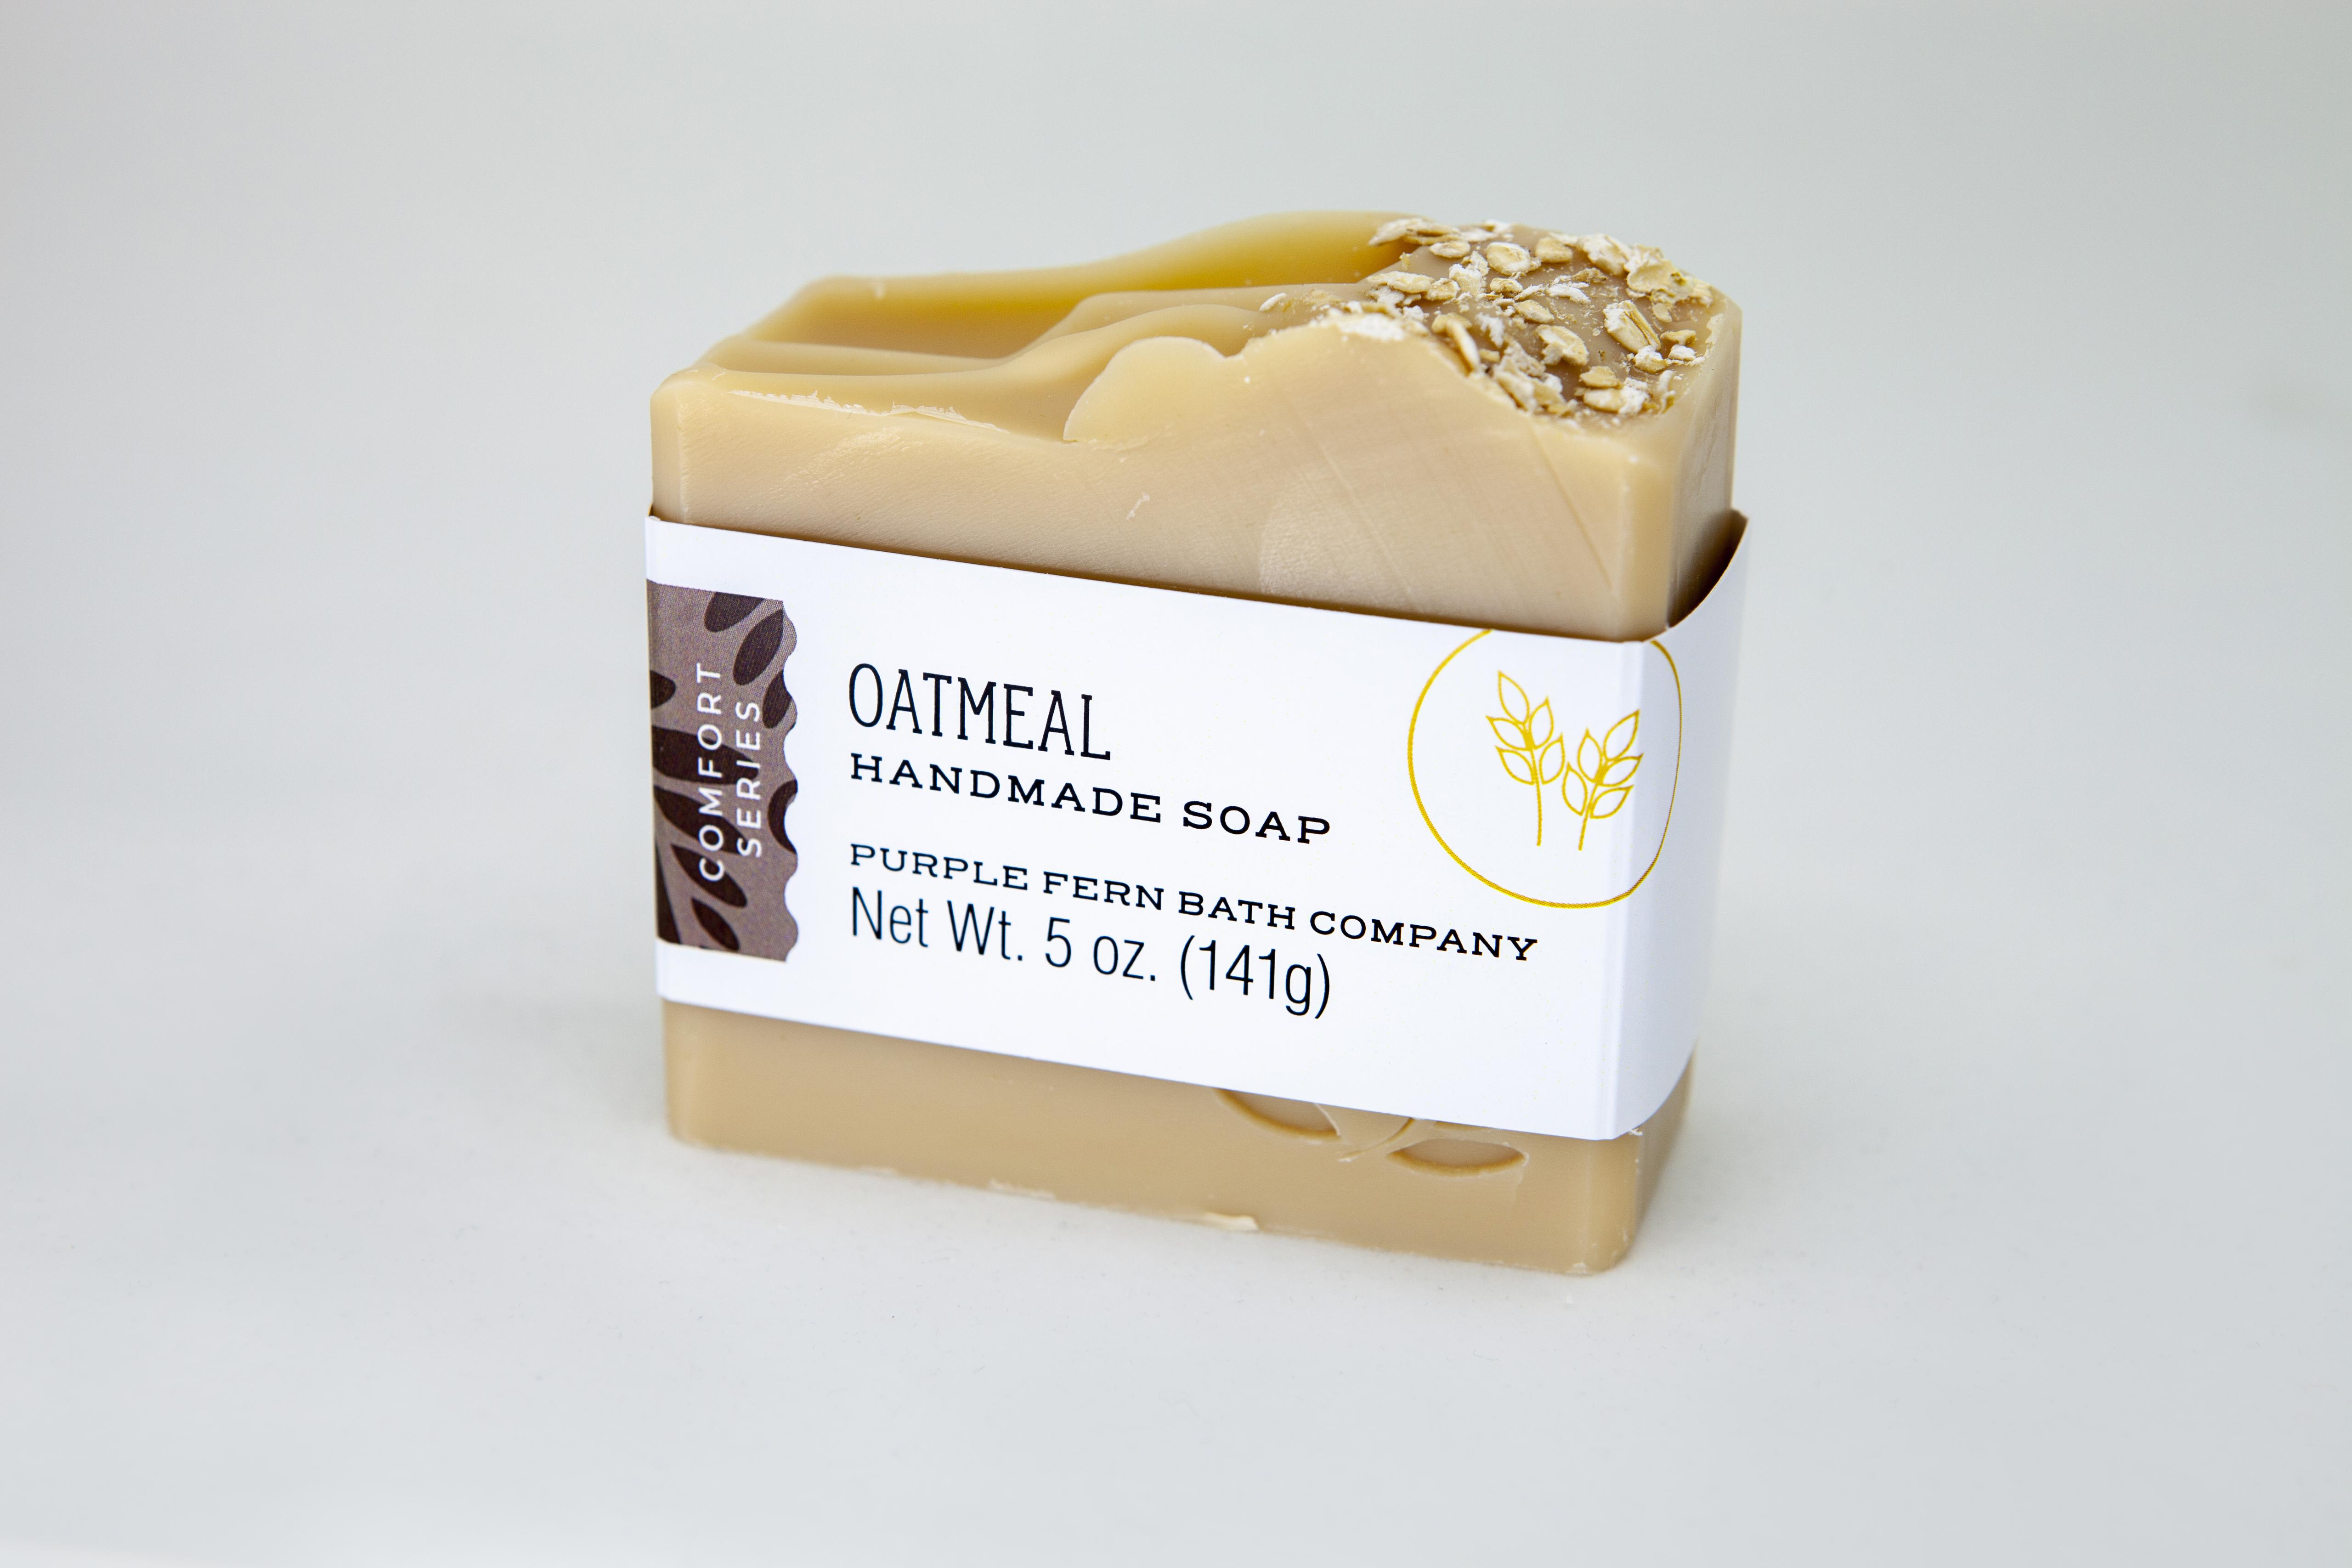 oatmeal bar soap handmade